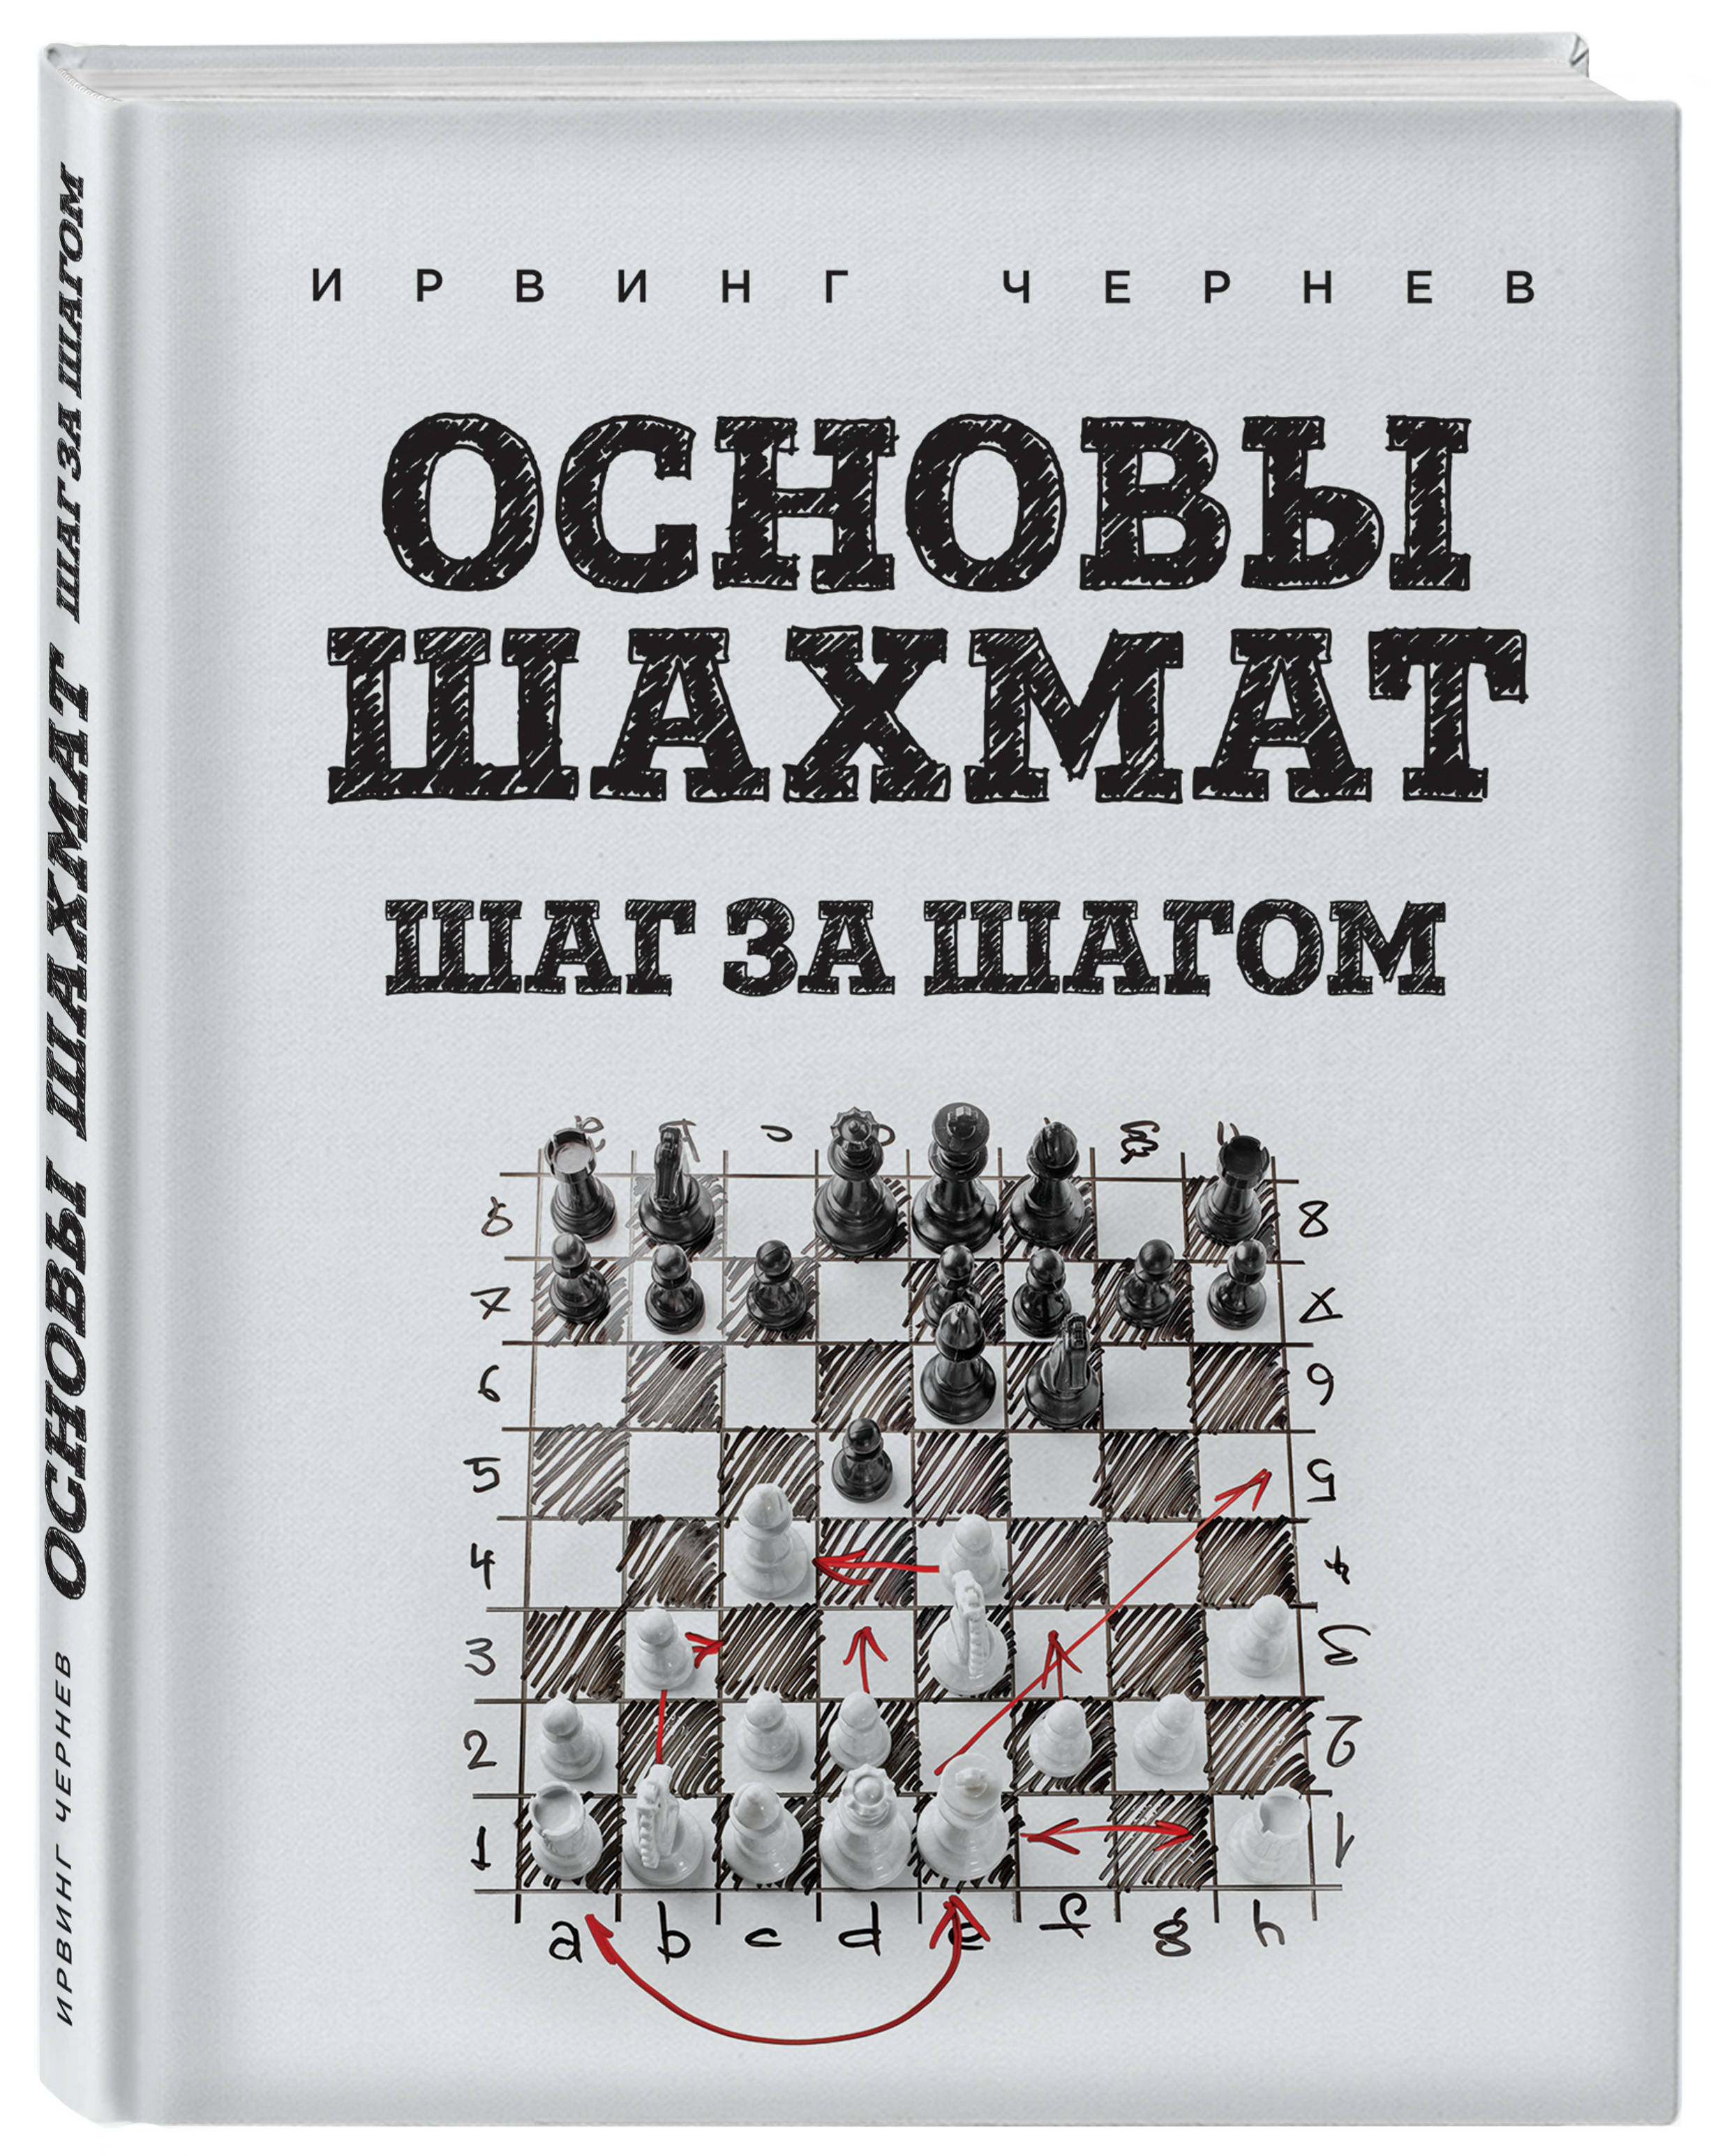 Основы шахмат. Шаг за шагом ( Чернев И.  )